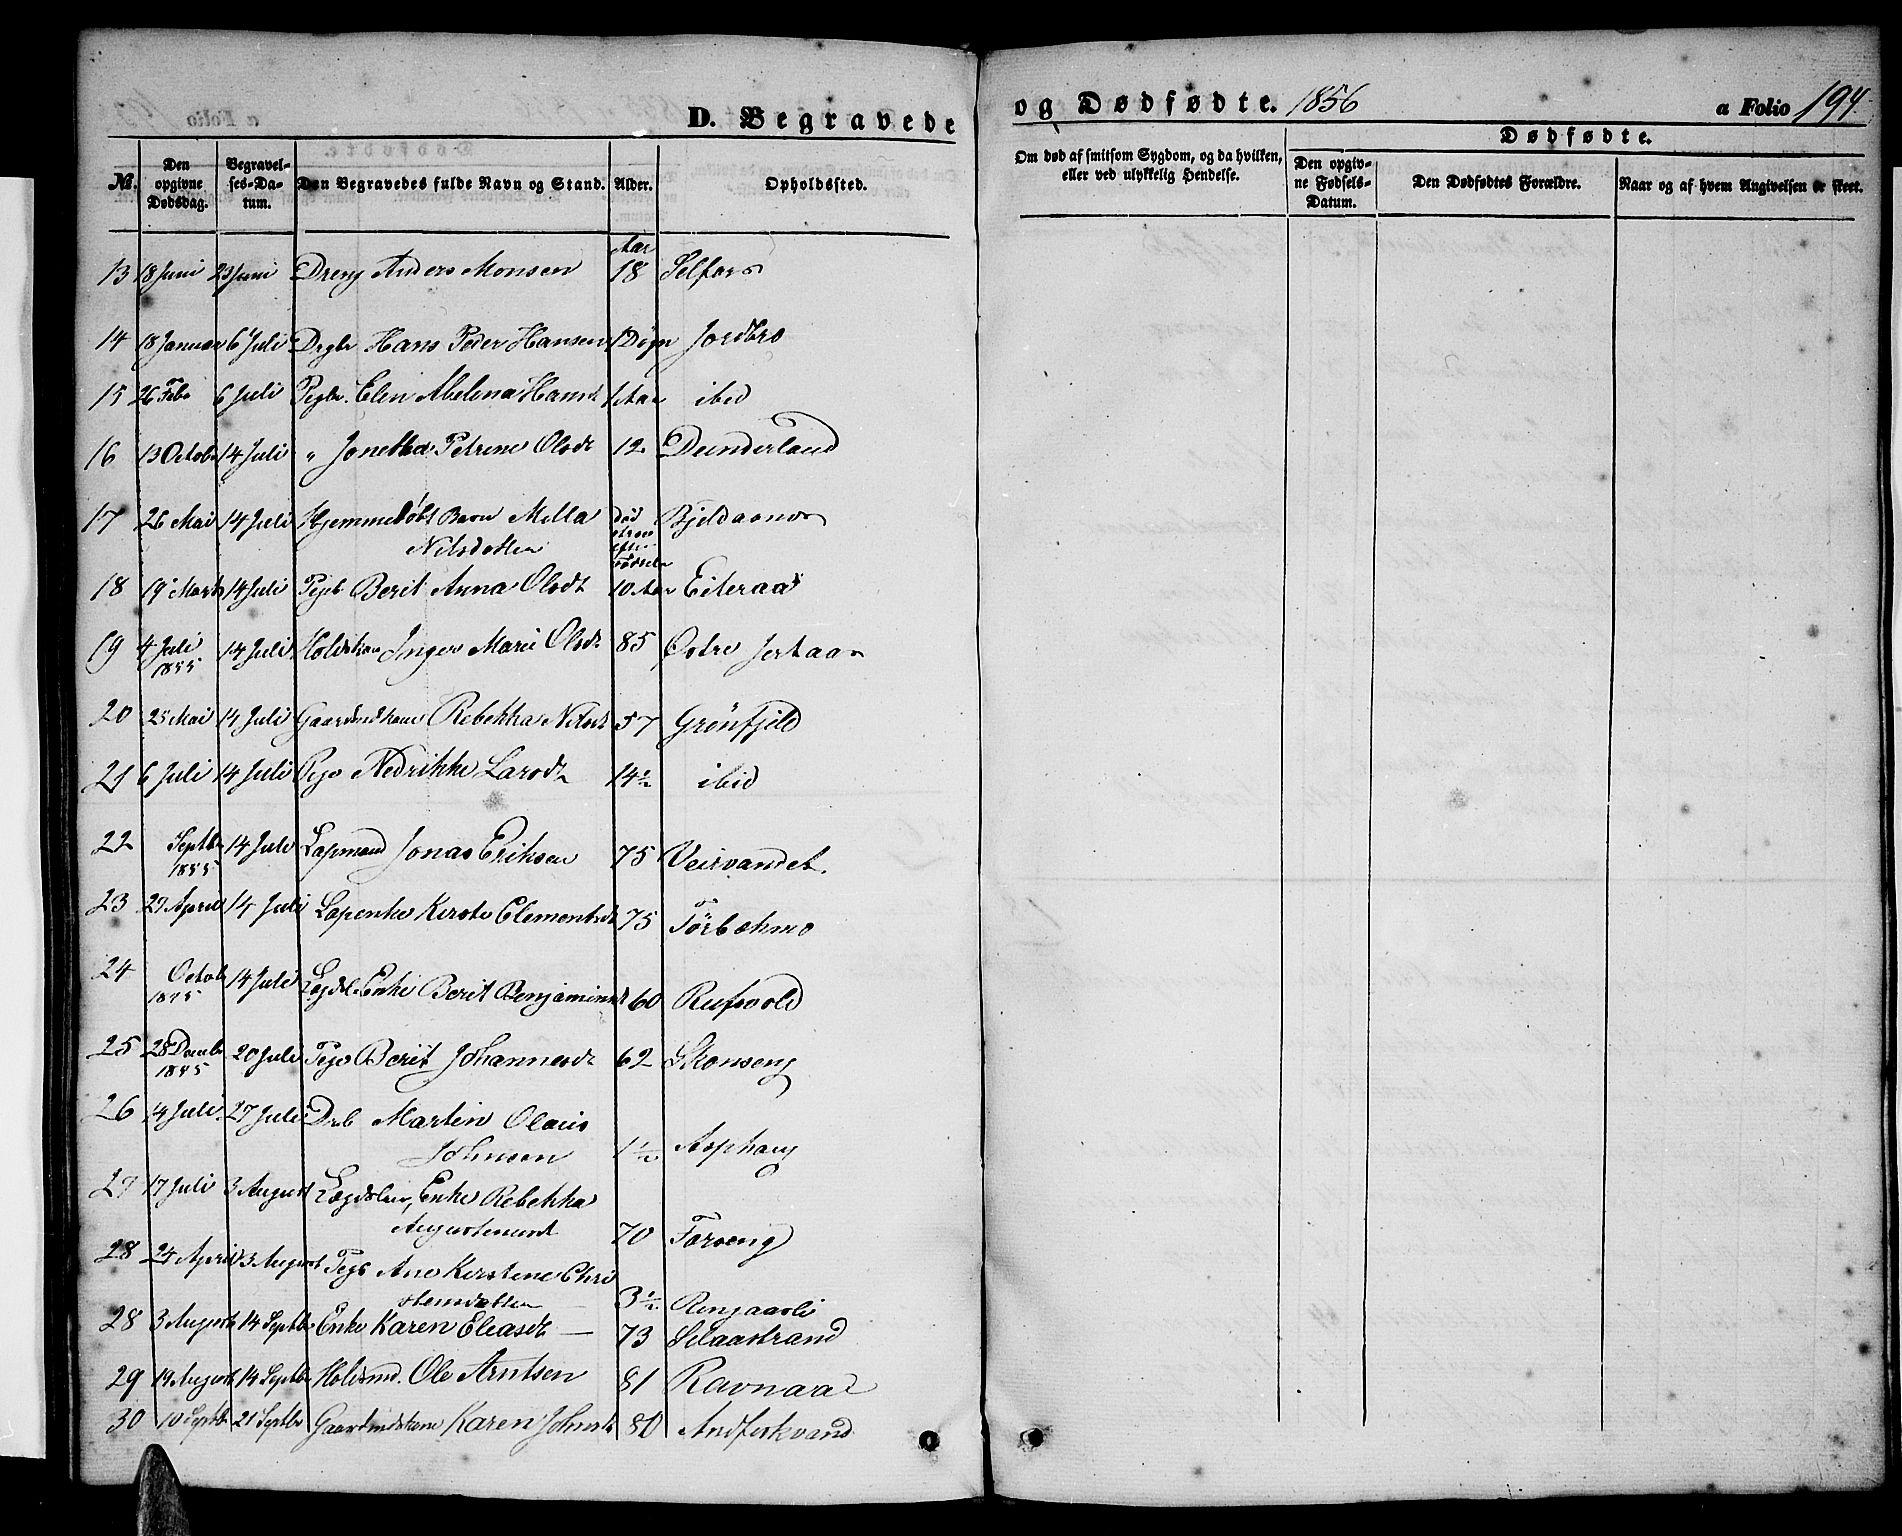 SAT, Ministerialprotokoller, klokkerbøker og fødselsregistre - Nordland, 827/L0414: Klokkerbok nr. 827C03, 1853-1865, s. 194